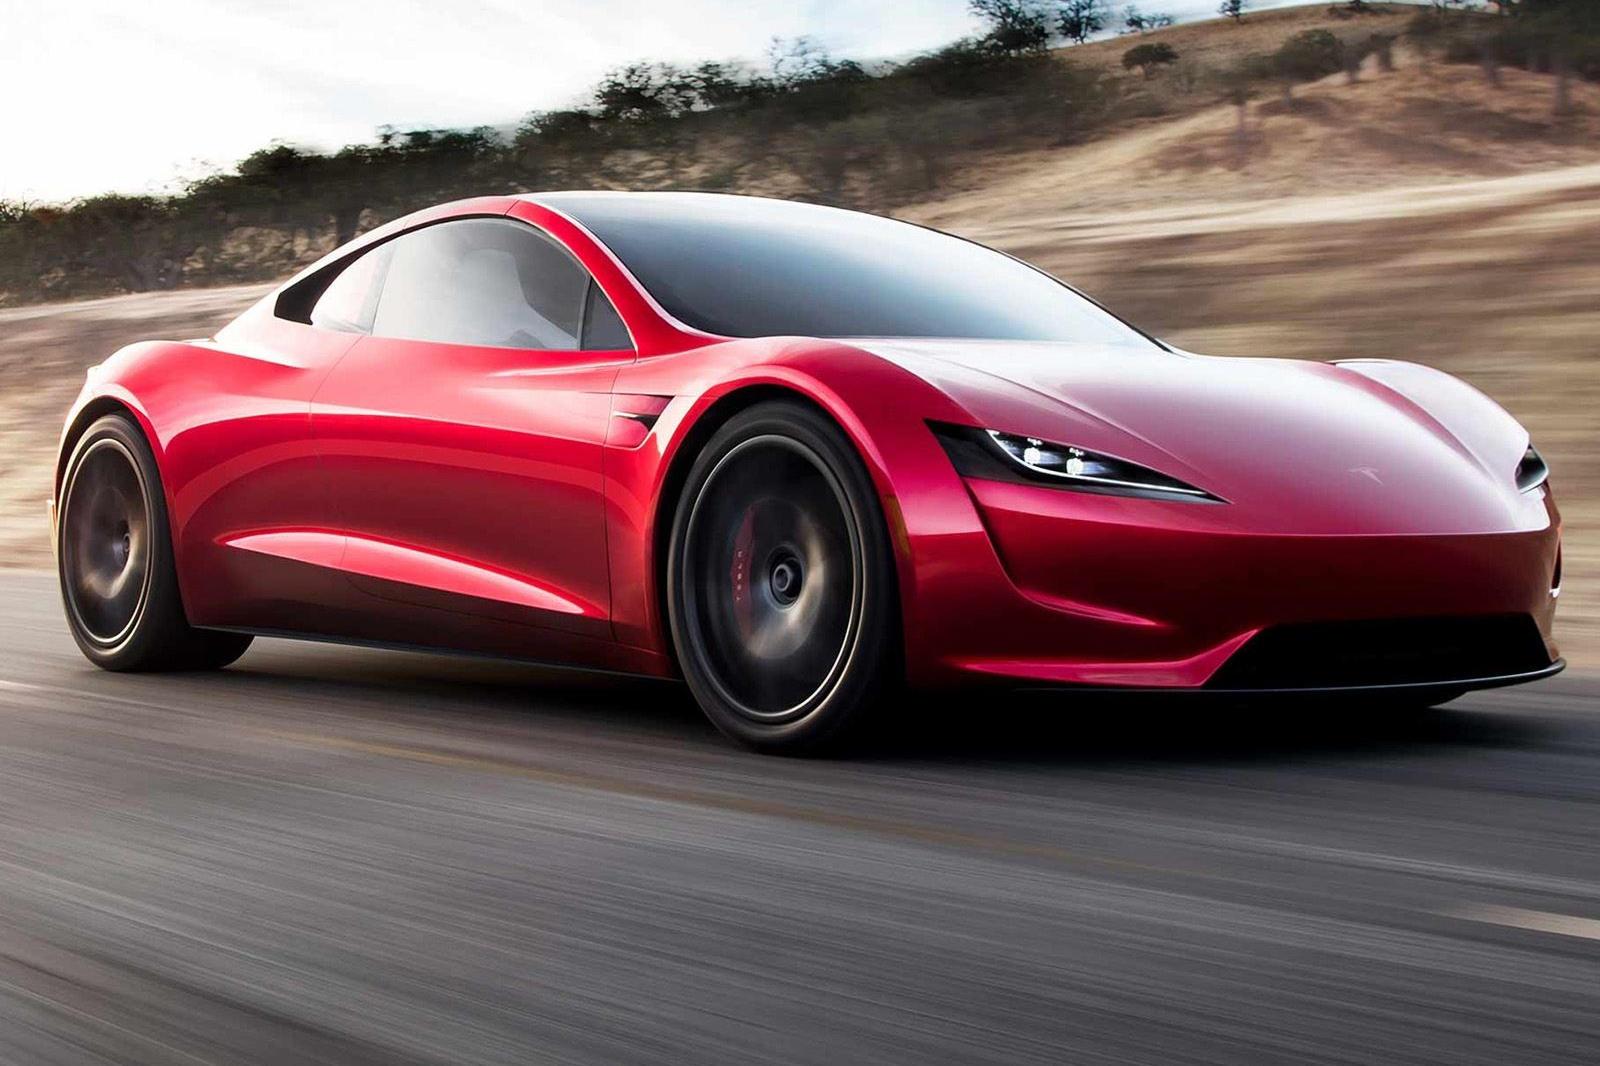 Tesla Kills Referral Program That Gave Away Roadsters